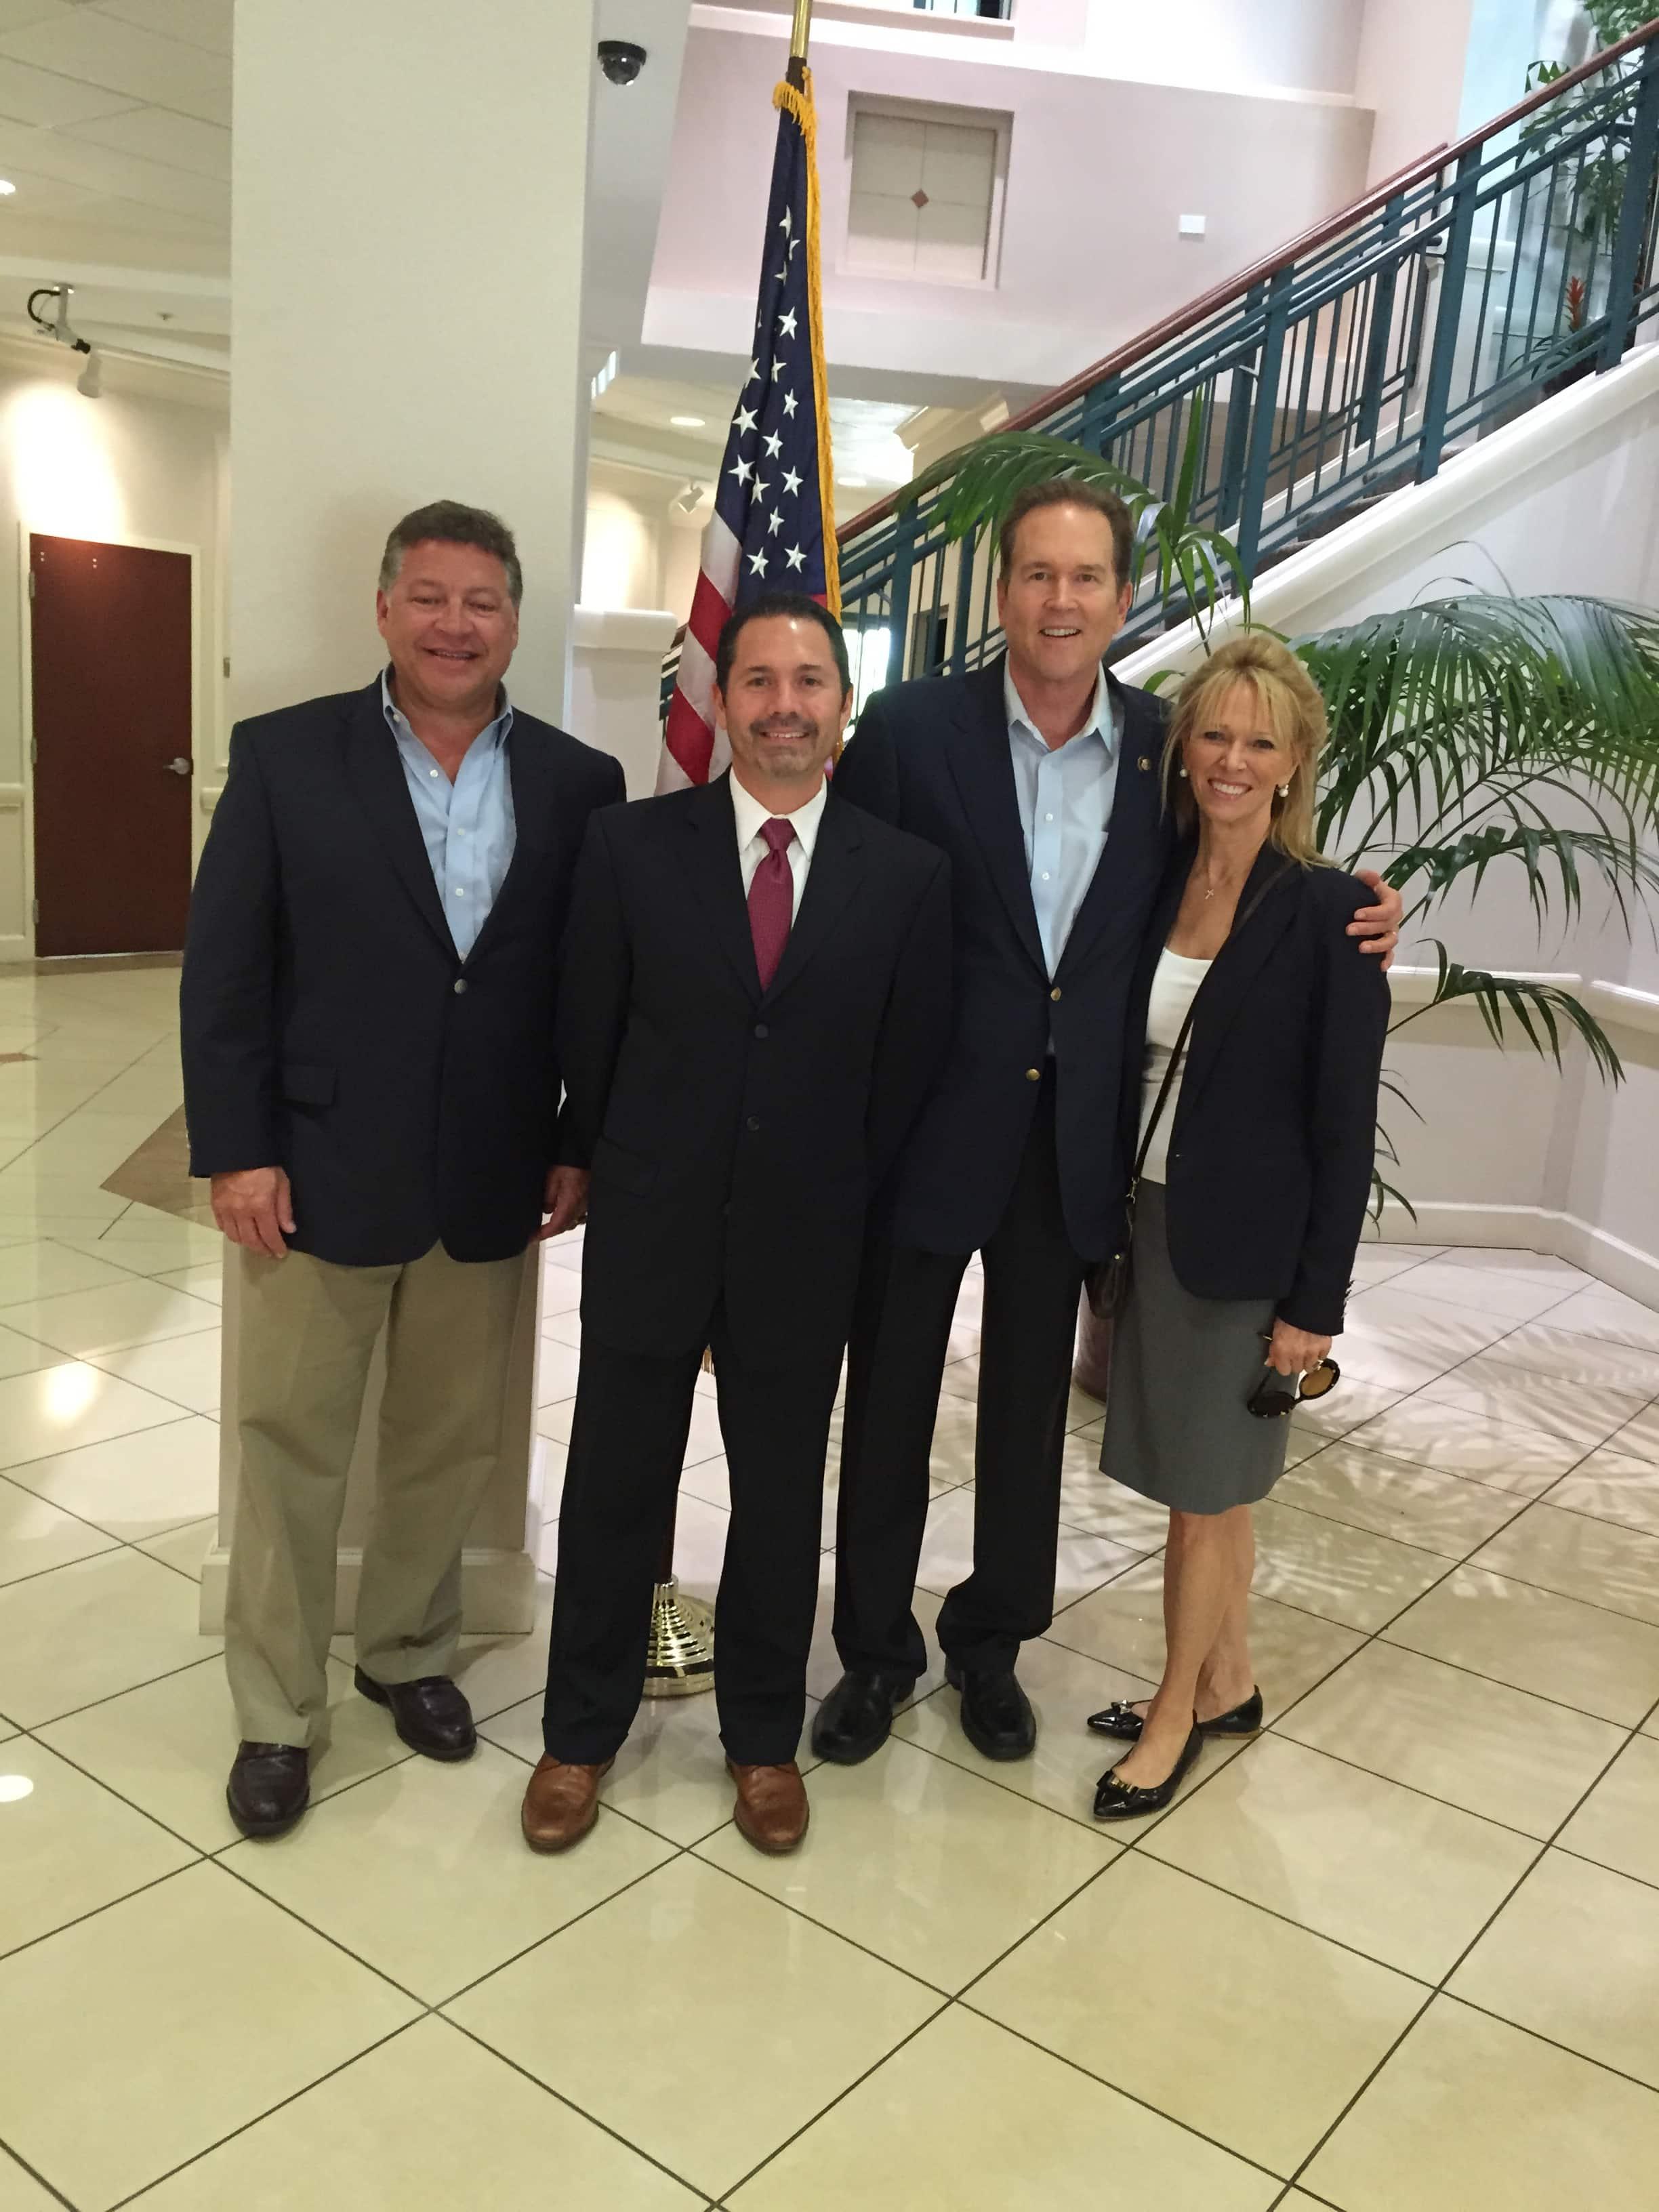 Public Statekholder Meeting on Transportation and Logistics Held at the Sarasota Campus